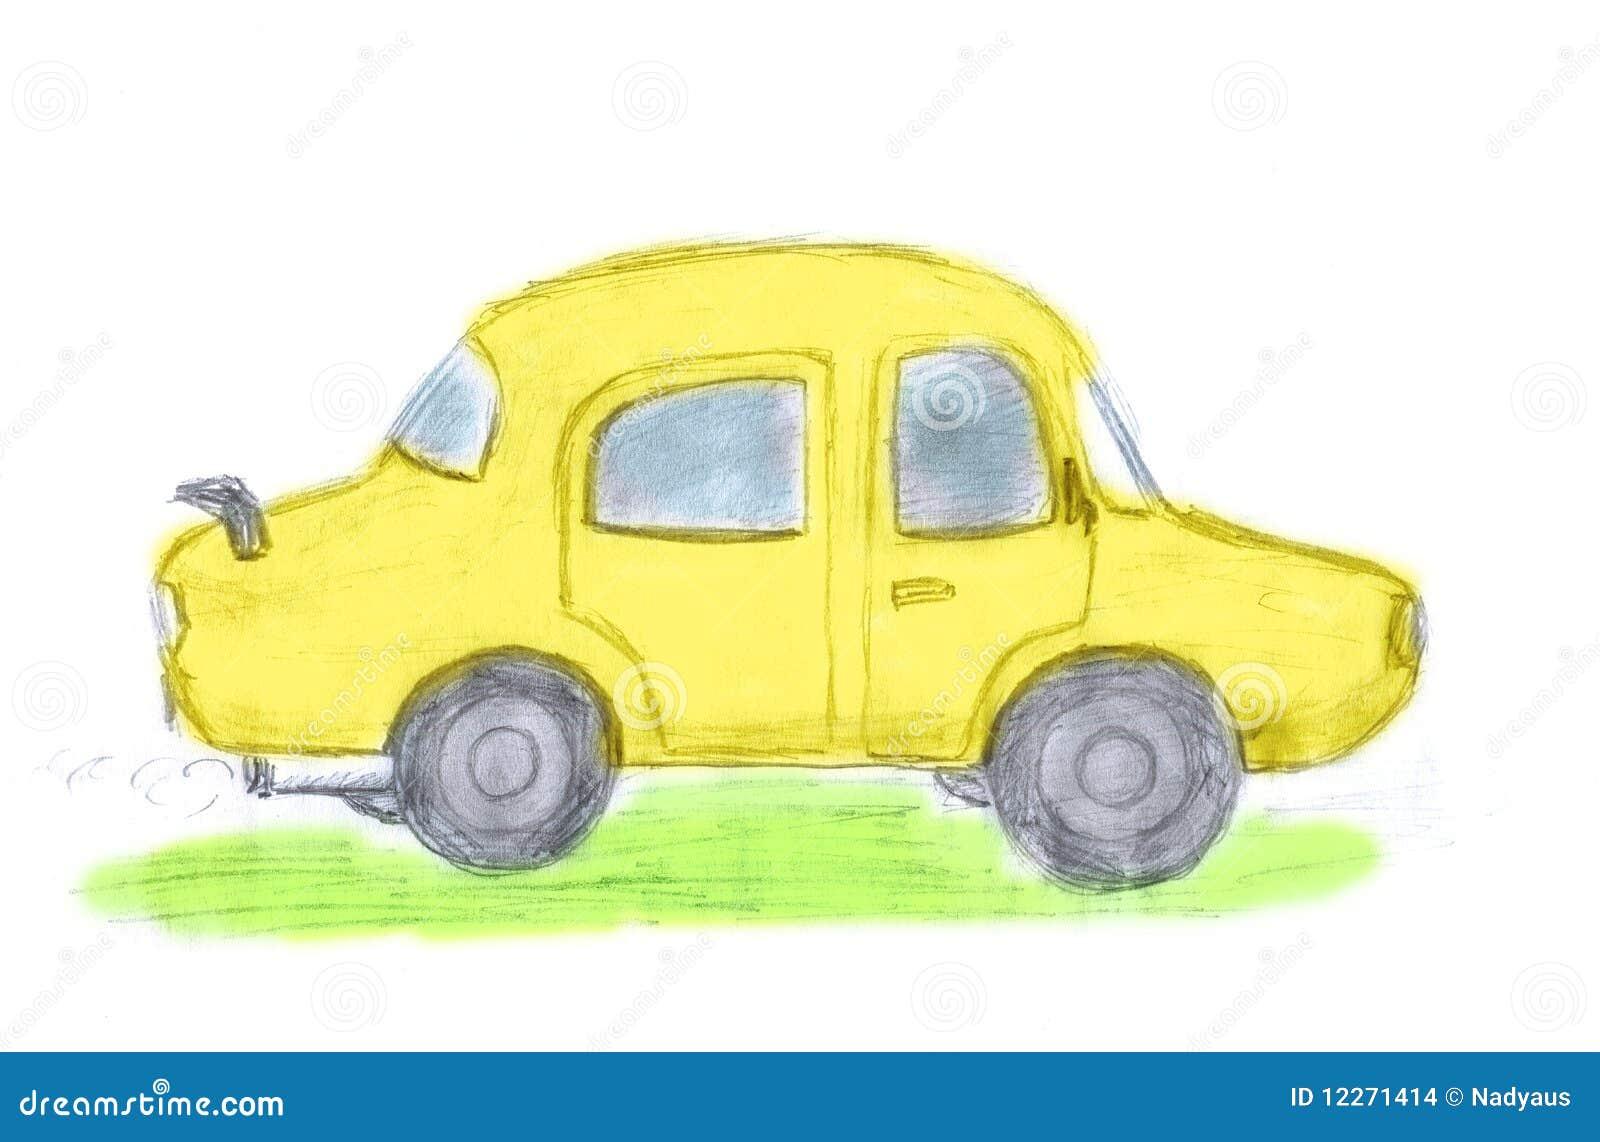 Car Drawing Kid Stock Illustrations 7 121 Car Drawing Kid Stock Illustrations Vectors Clipart Dreamstime